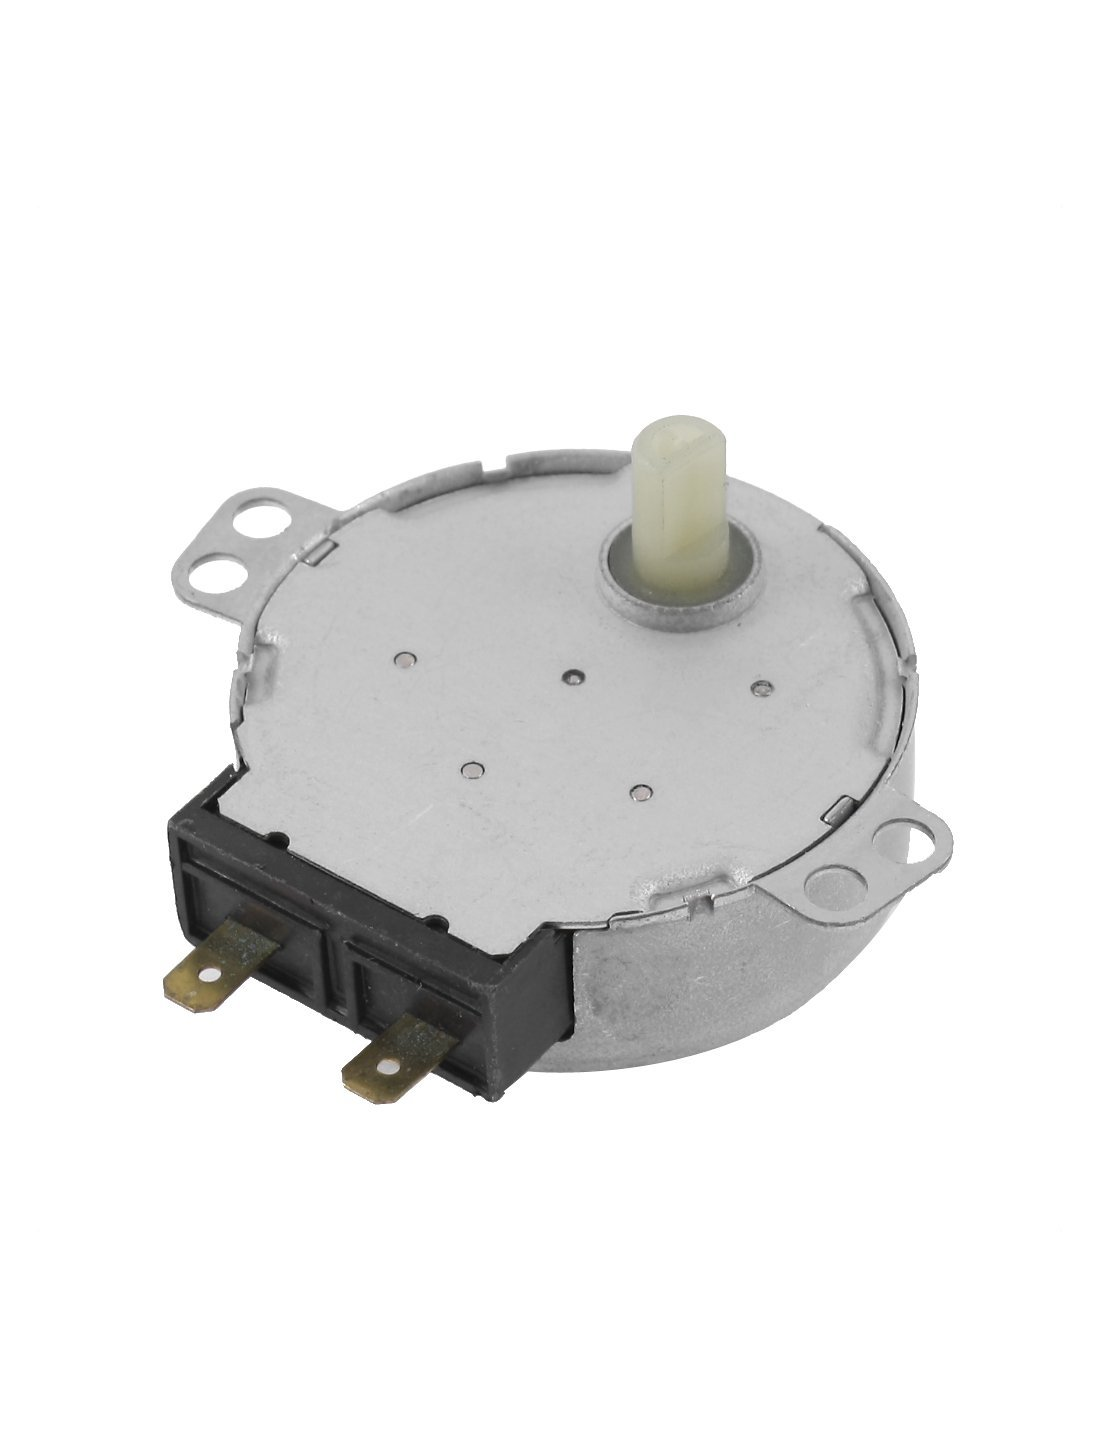 AC 30V 3.5 / 4W 4 / 5RPM Motor síncrono 49TYZ para horno ...